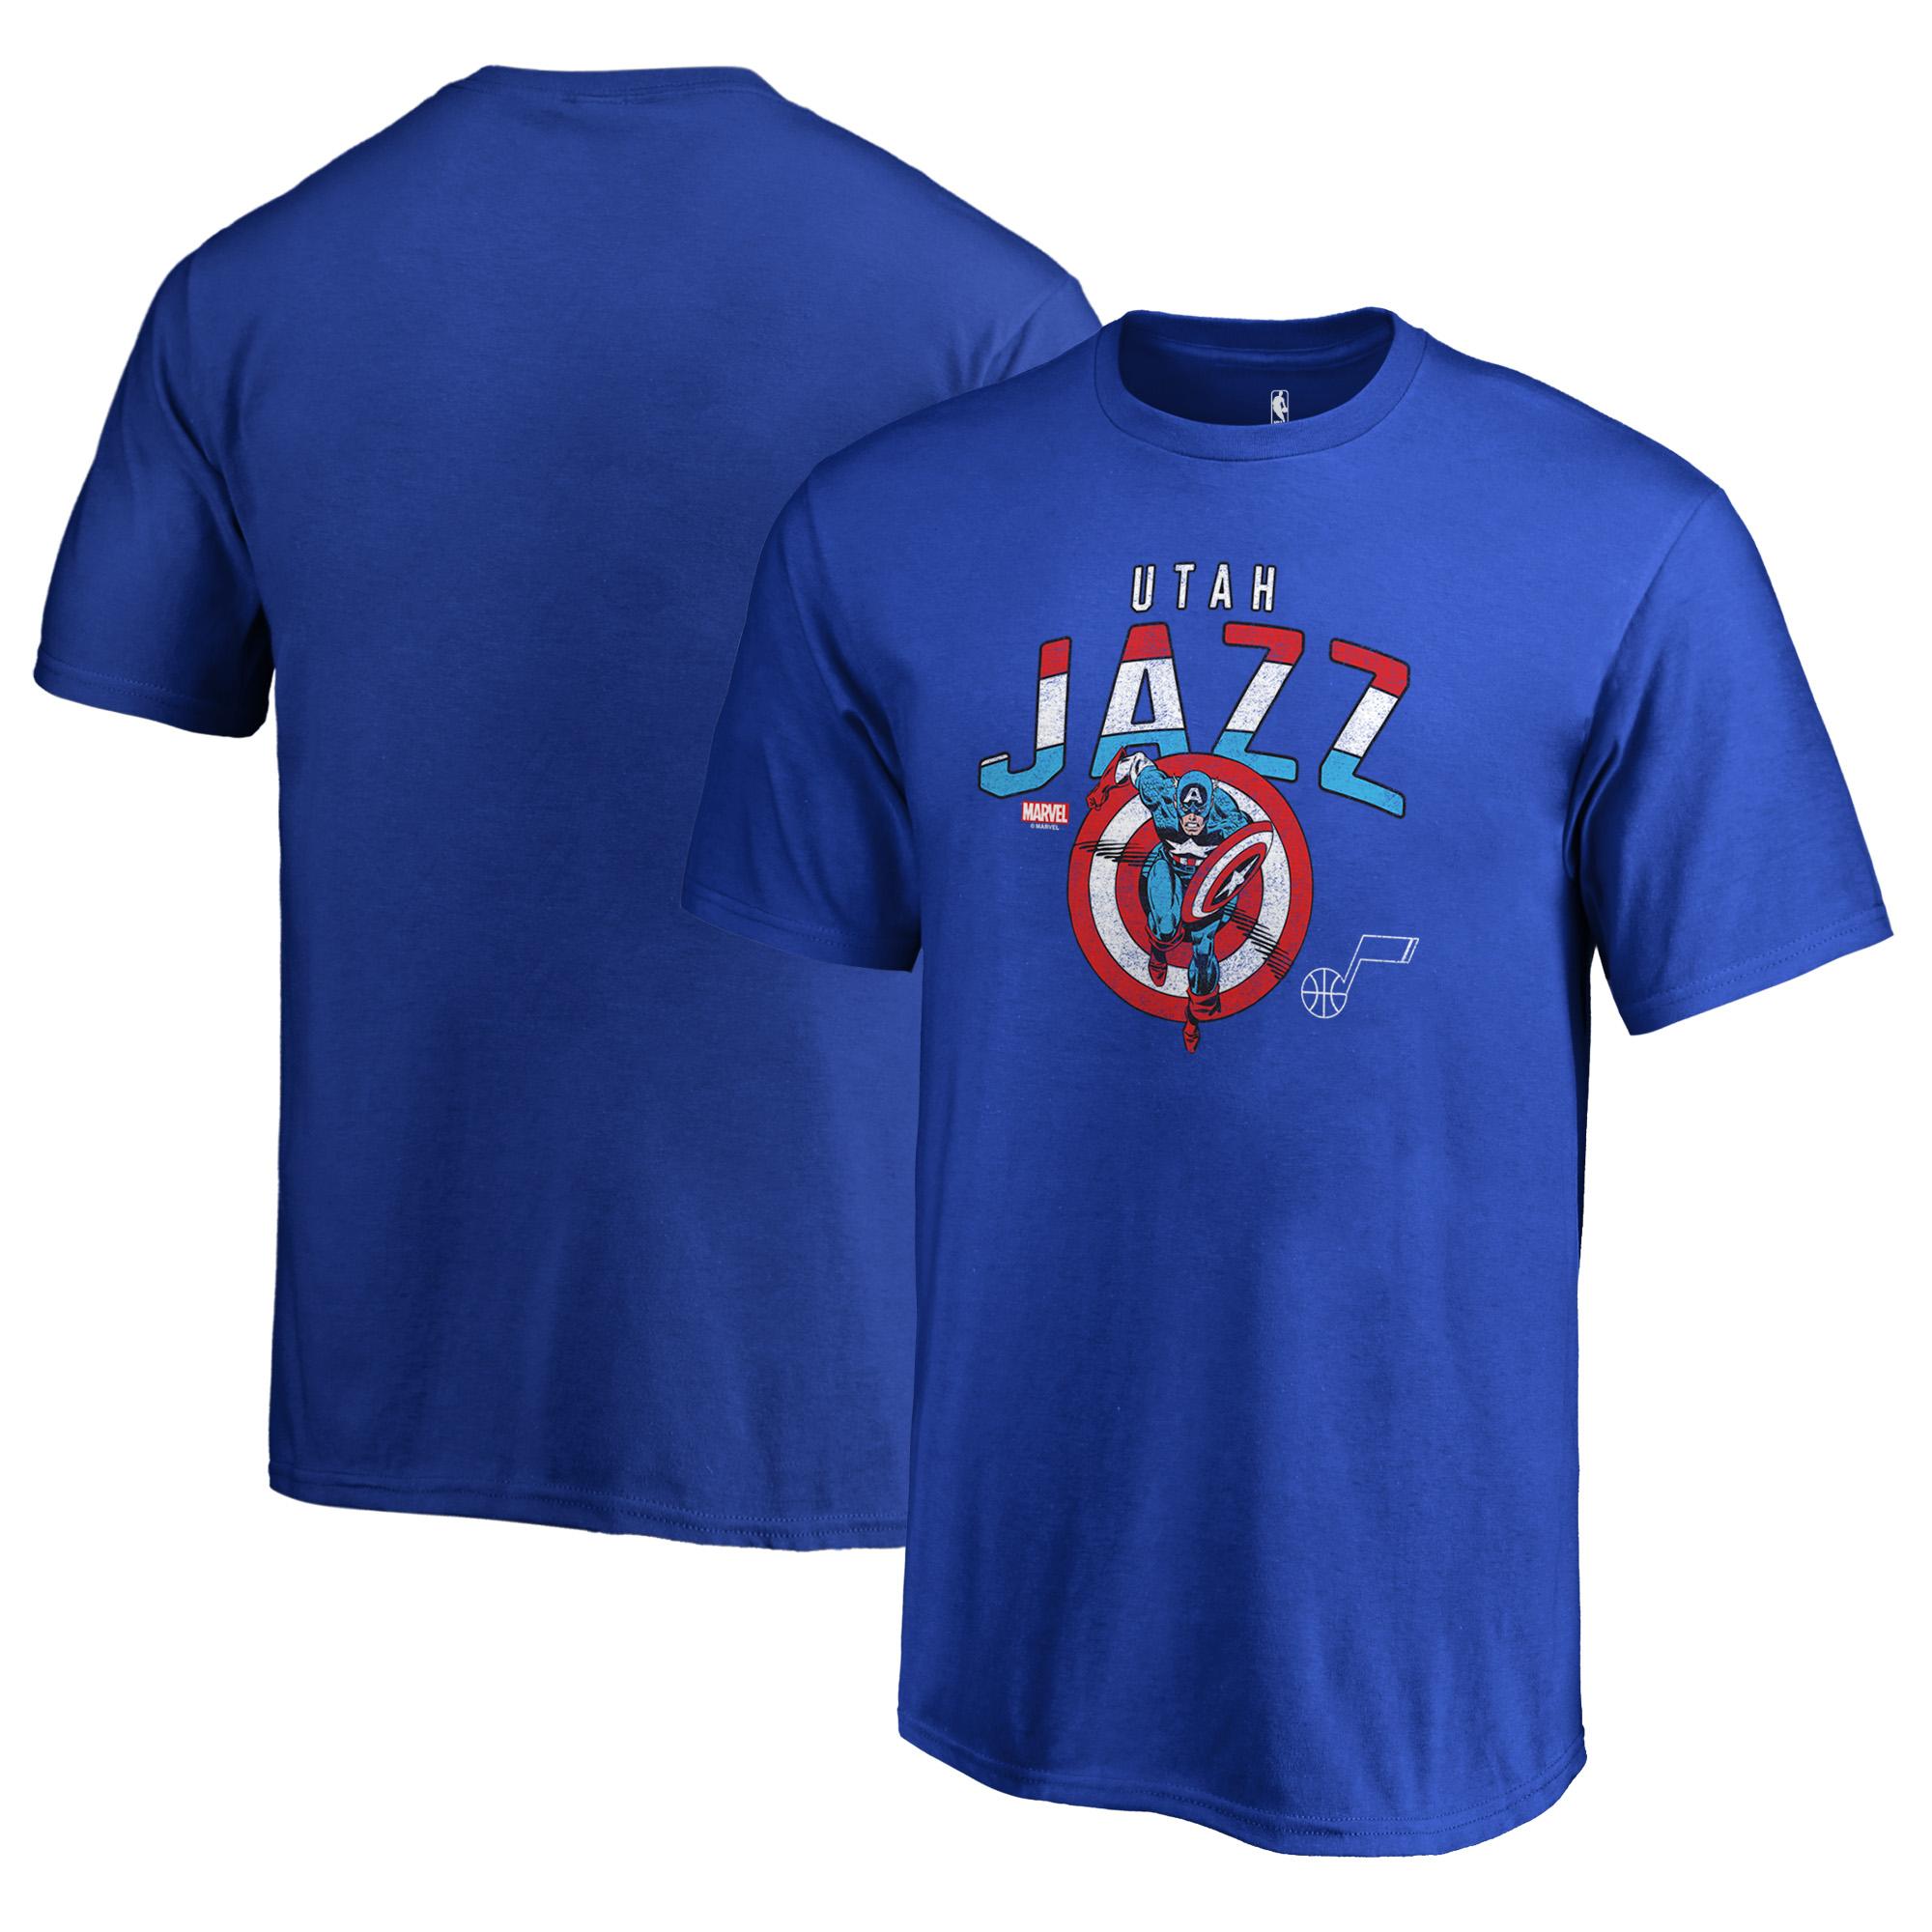 Utah Jazz Fanatics Branded Youth Captain's Shield T-Shirt - Royal